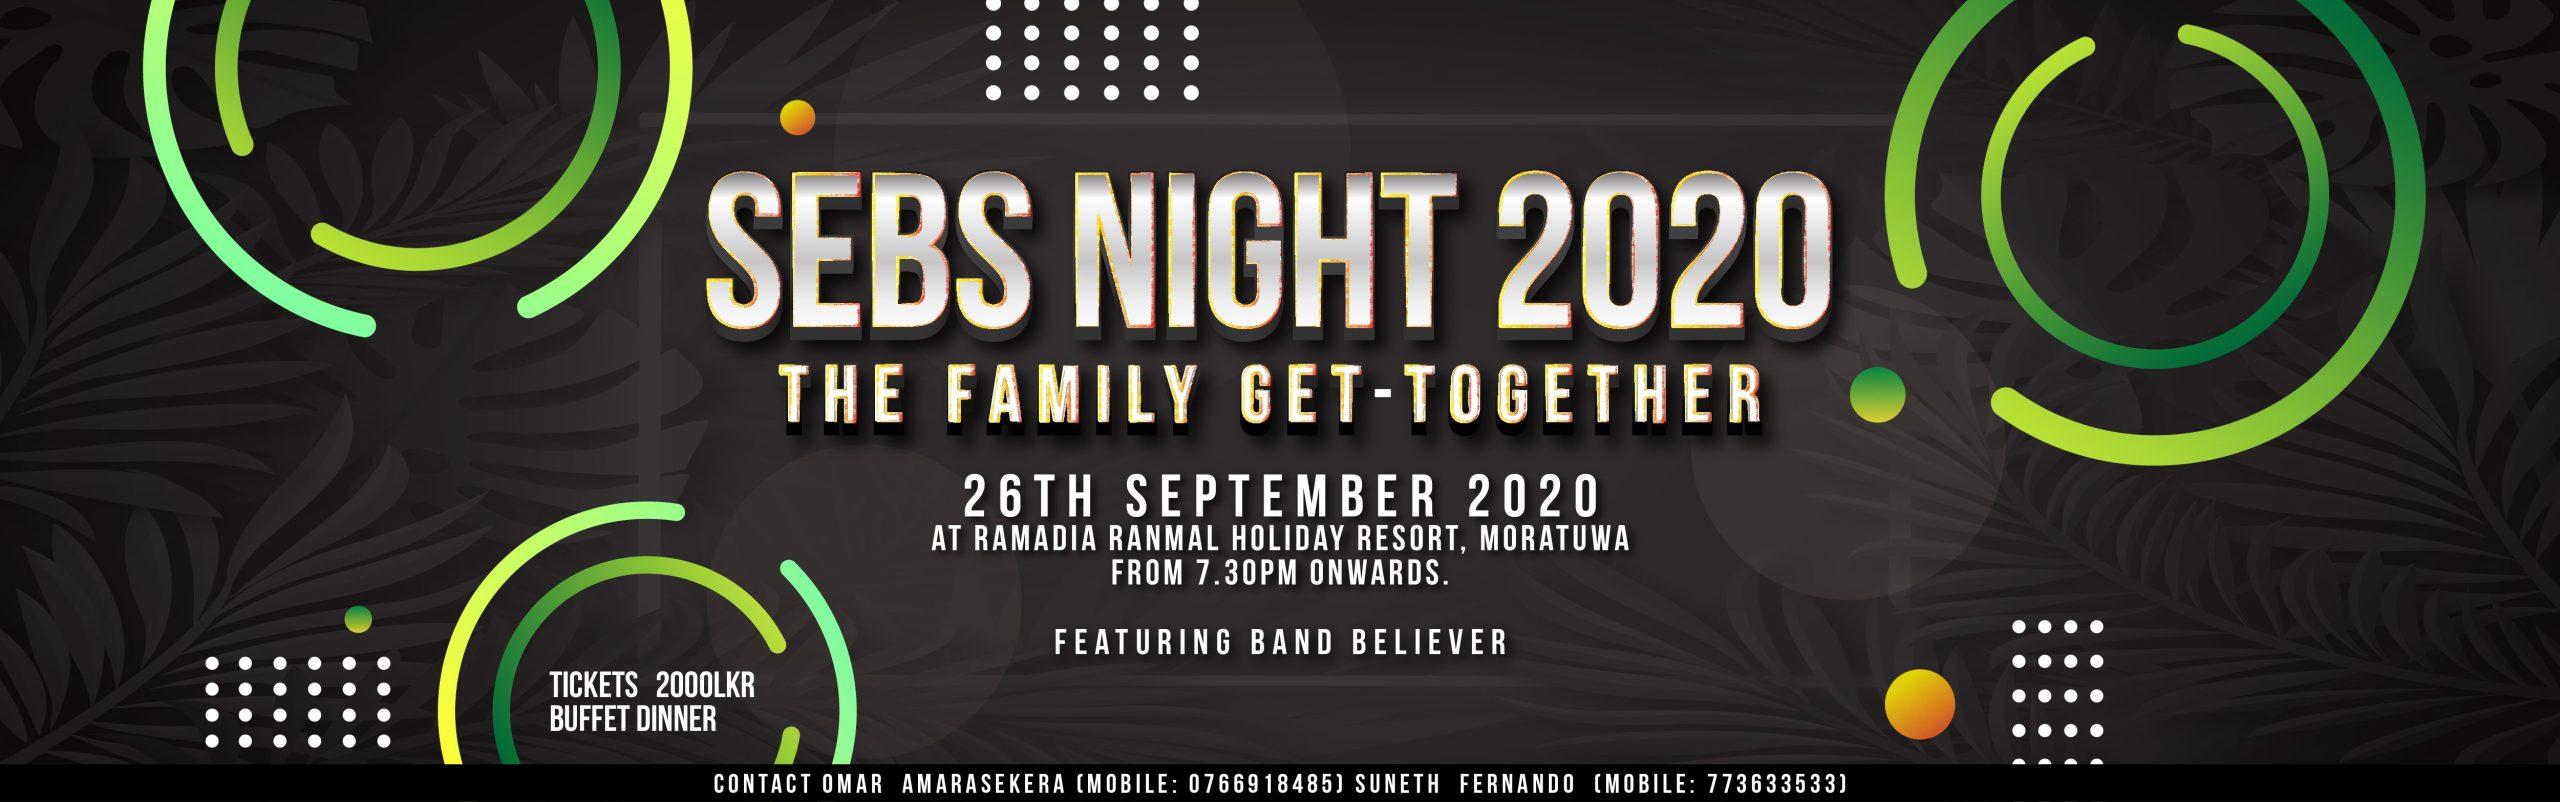 SEBS Night 2020